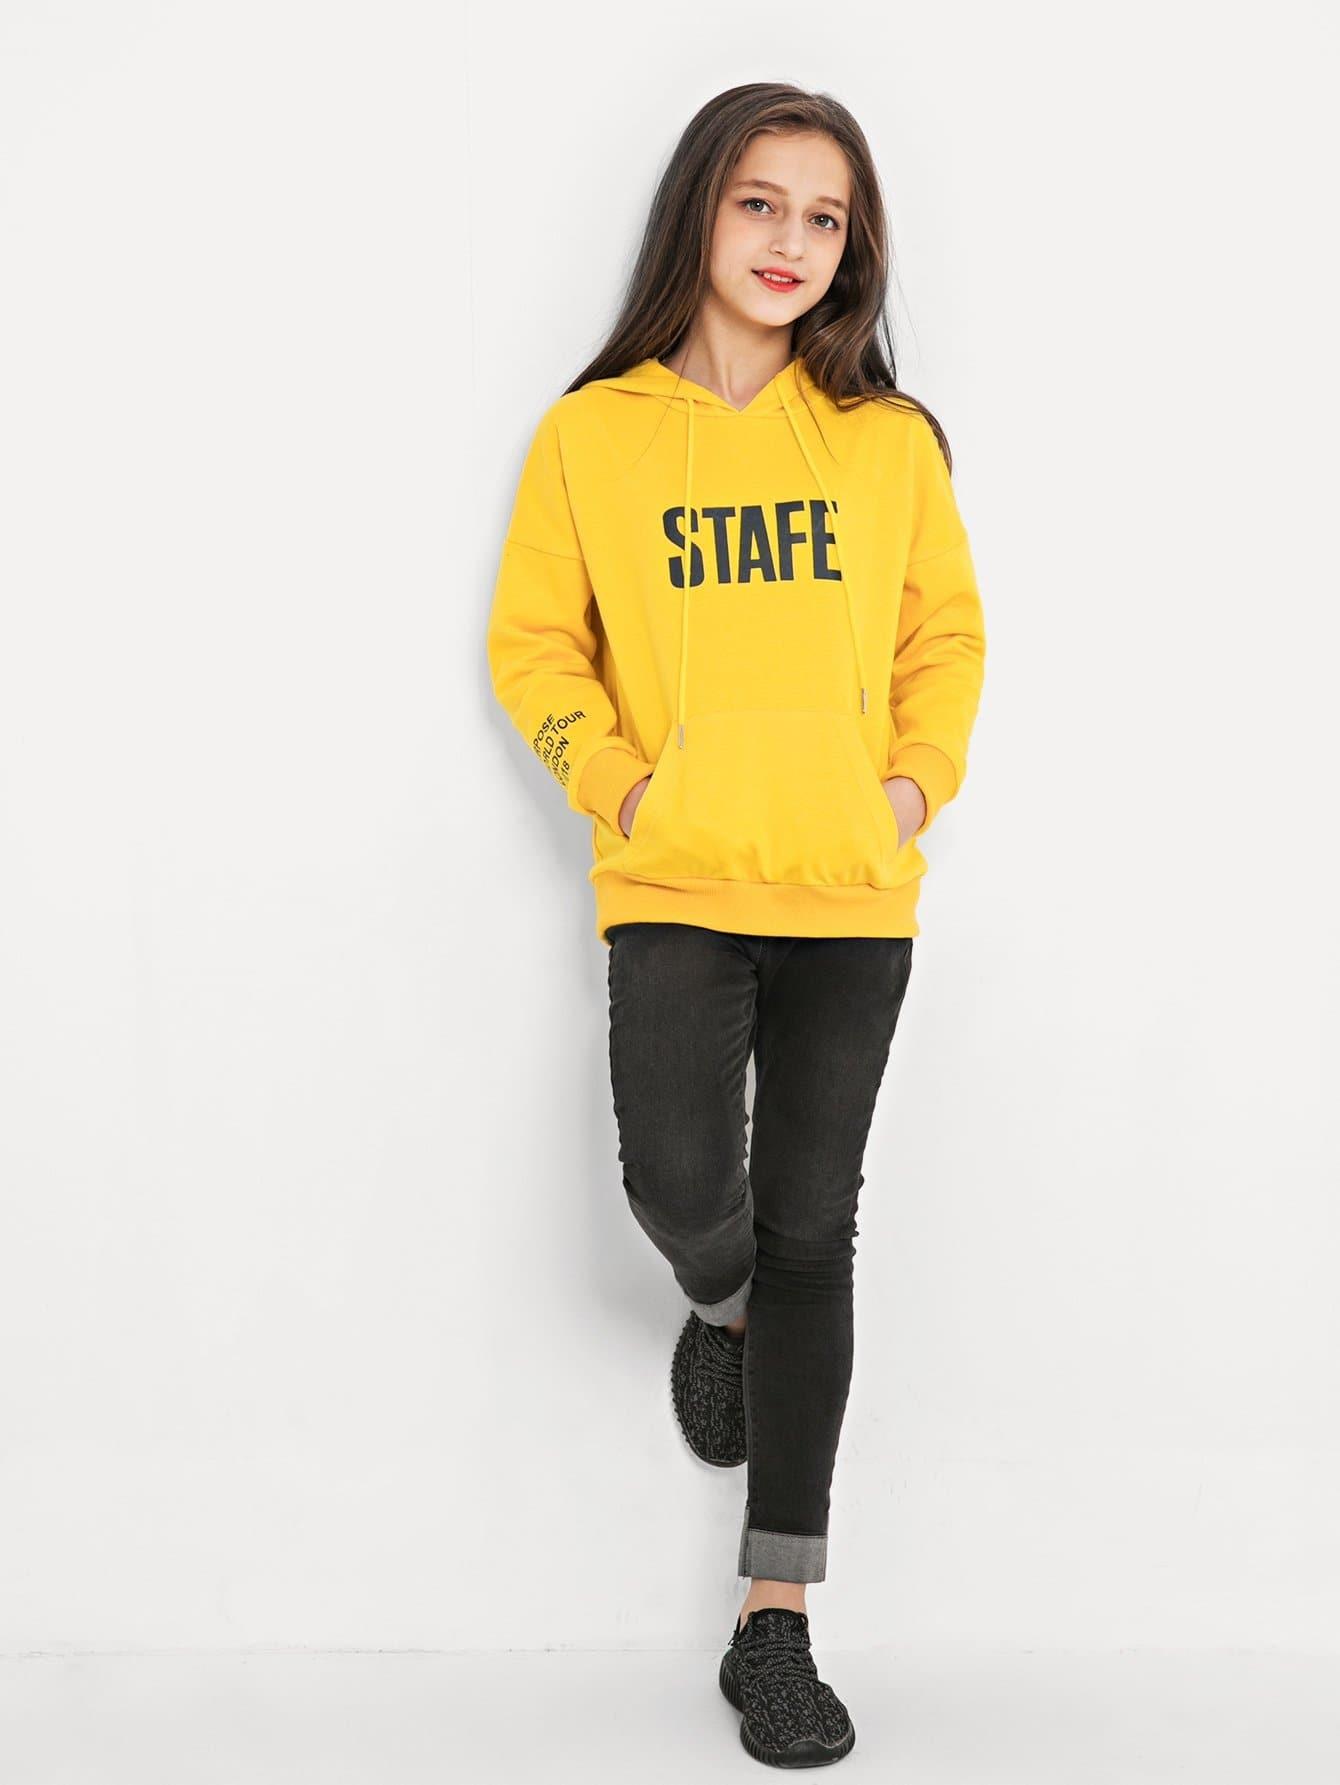 Girls Letter Print Hooded Sweatshirt